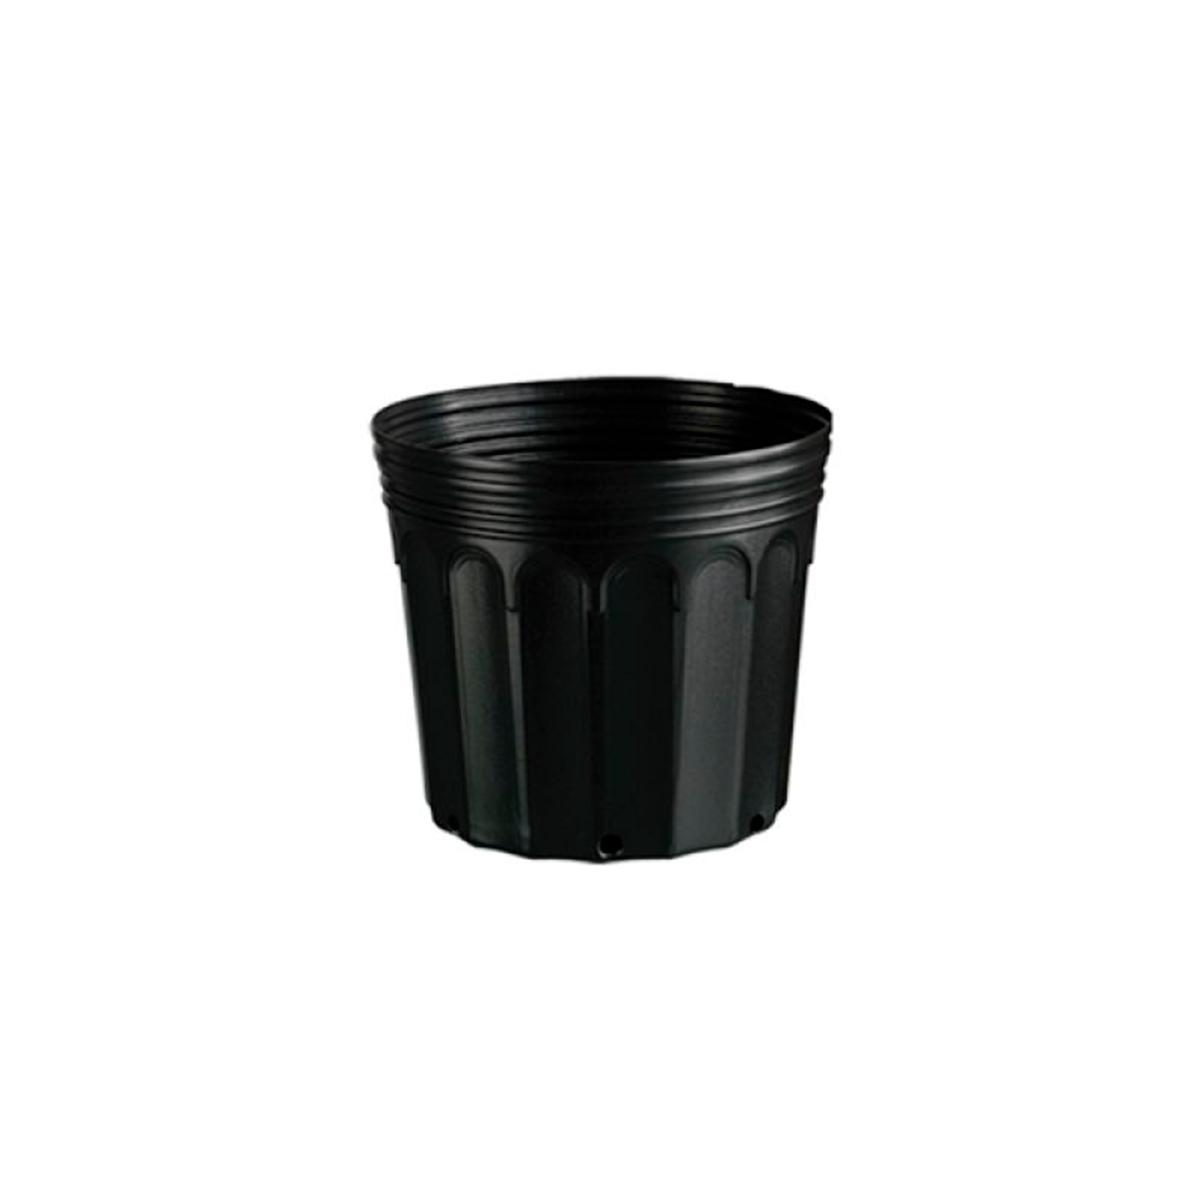 Kit 35 Embalagem Vaso para Mudas Plástico 3,6L